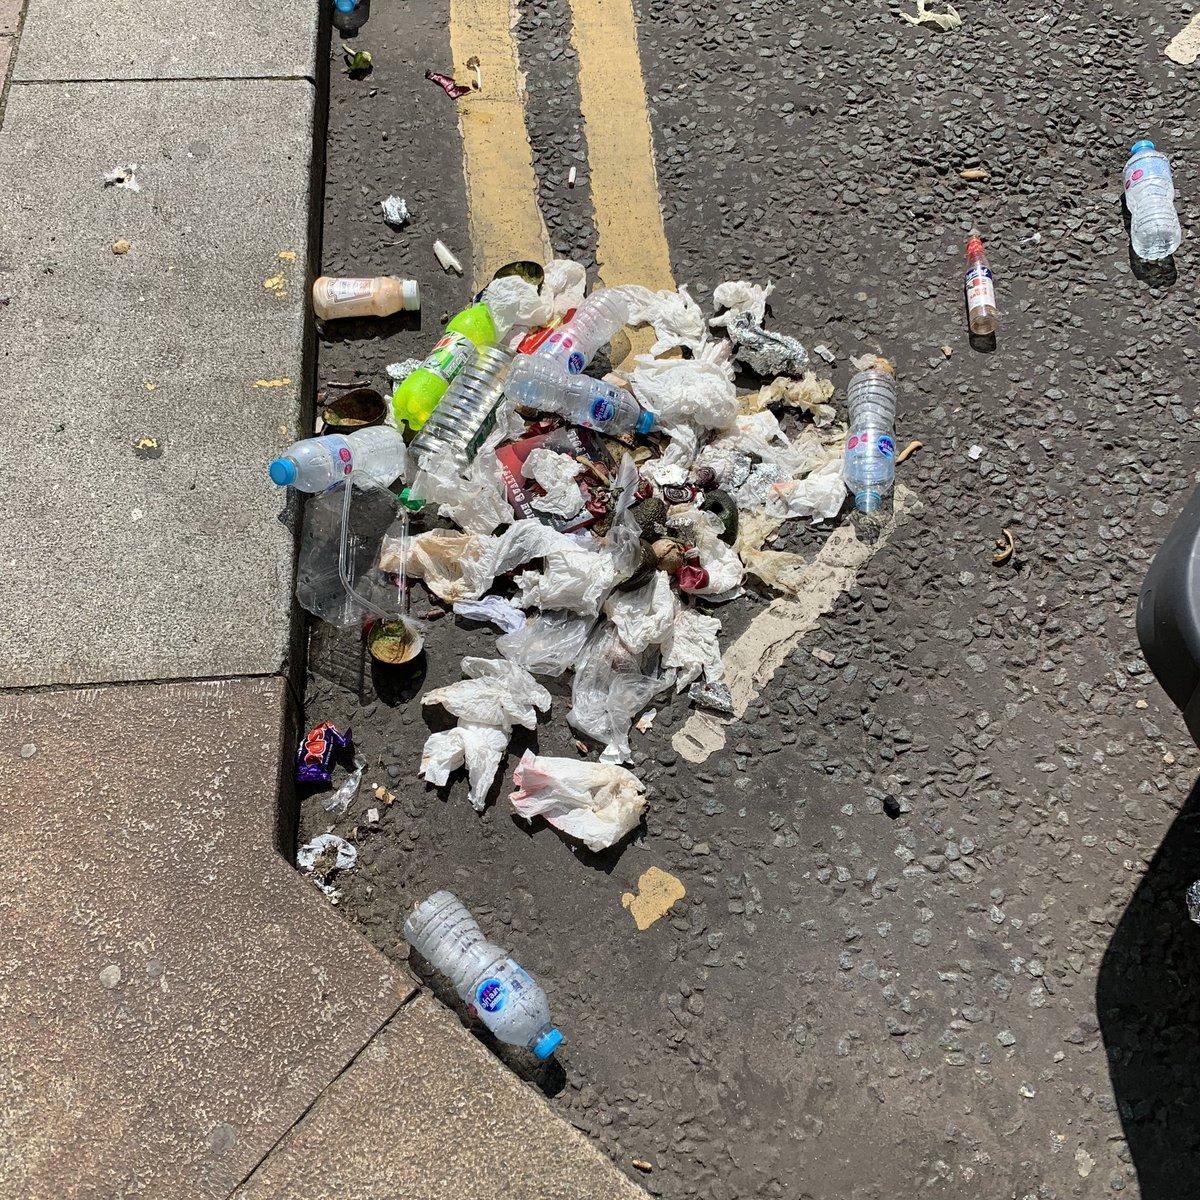 @GlasgowCC People Make Glasgow. #ingramstreet #merchantcity @cleanupbritain